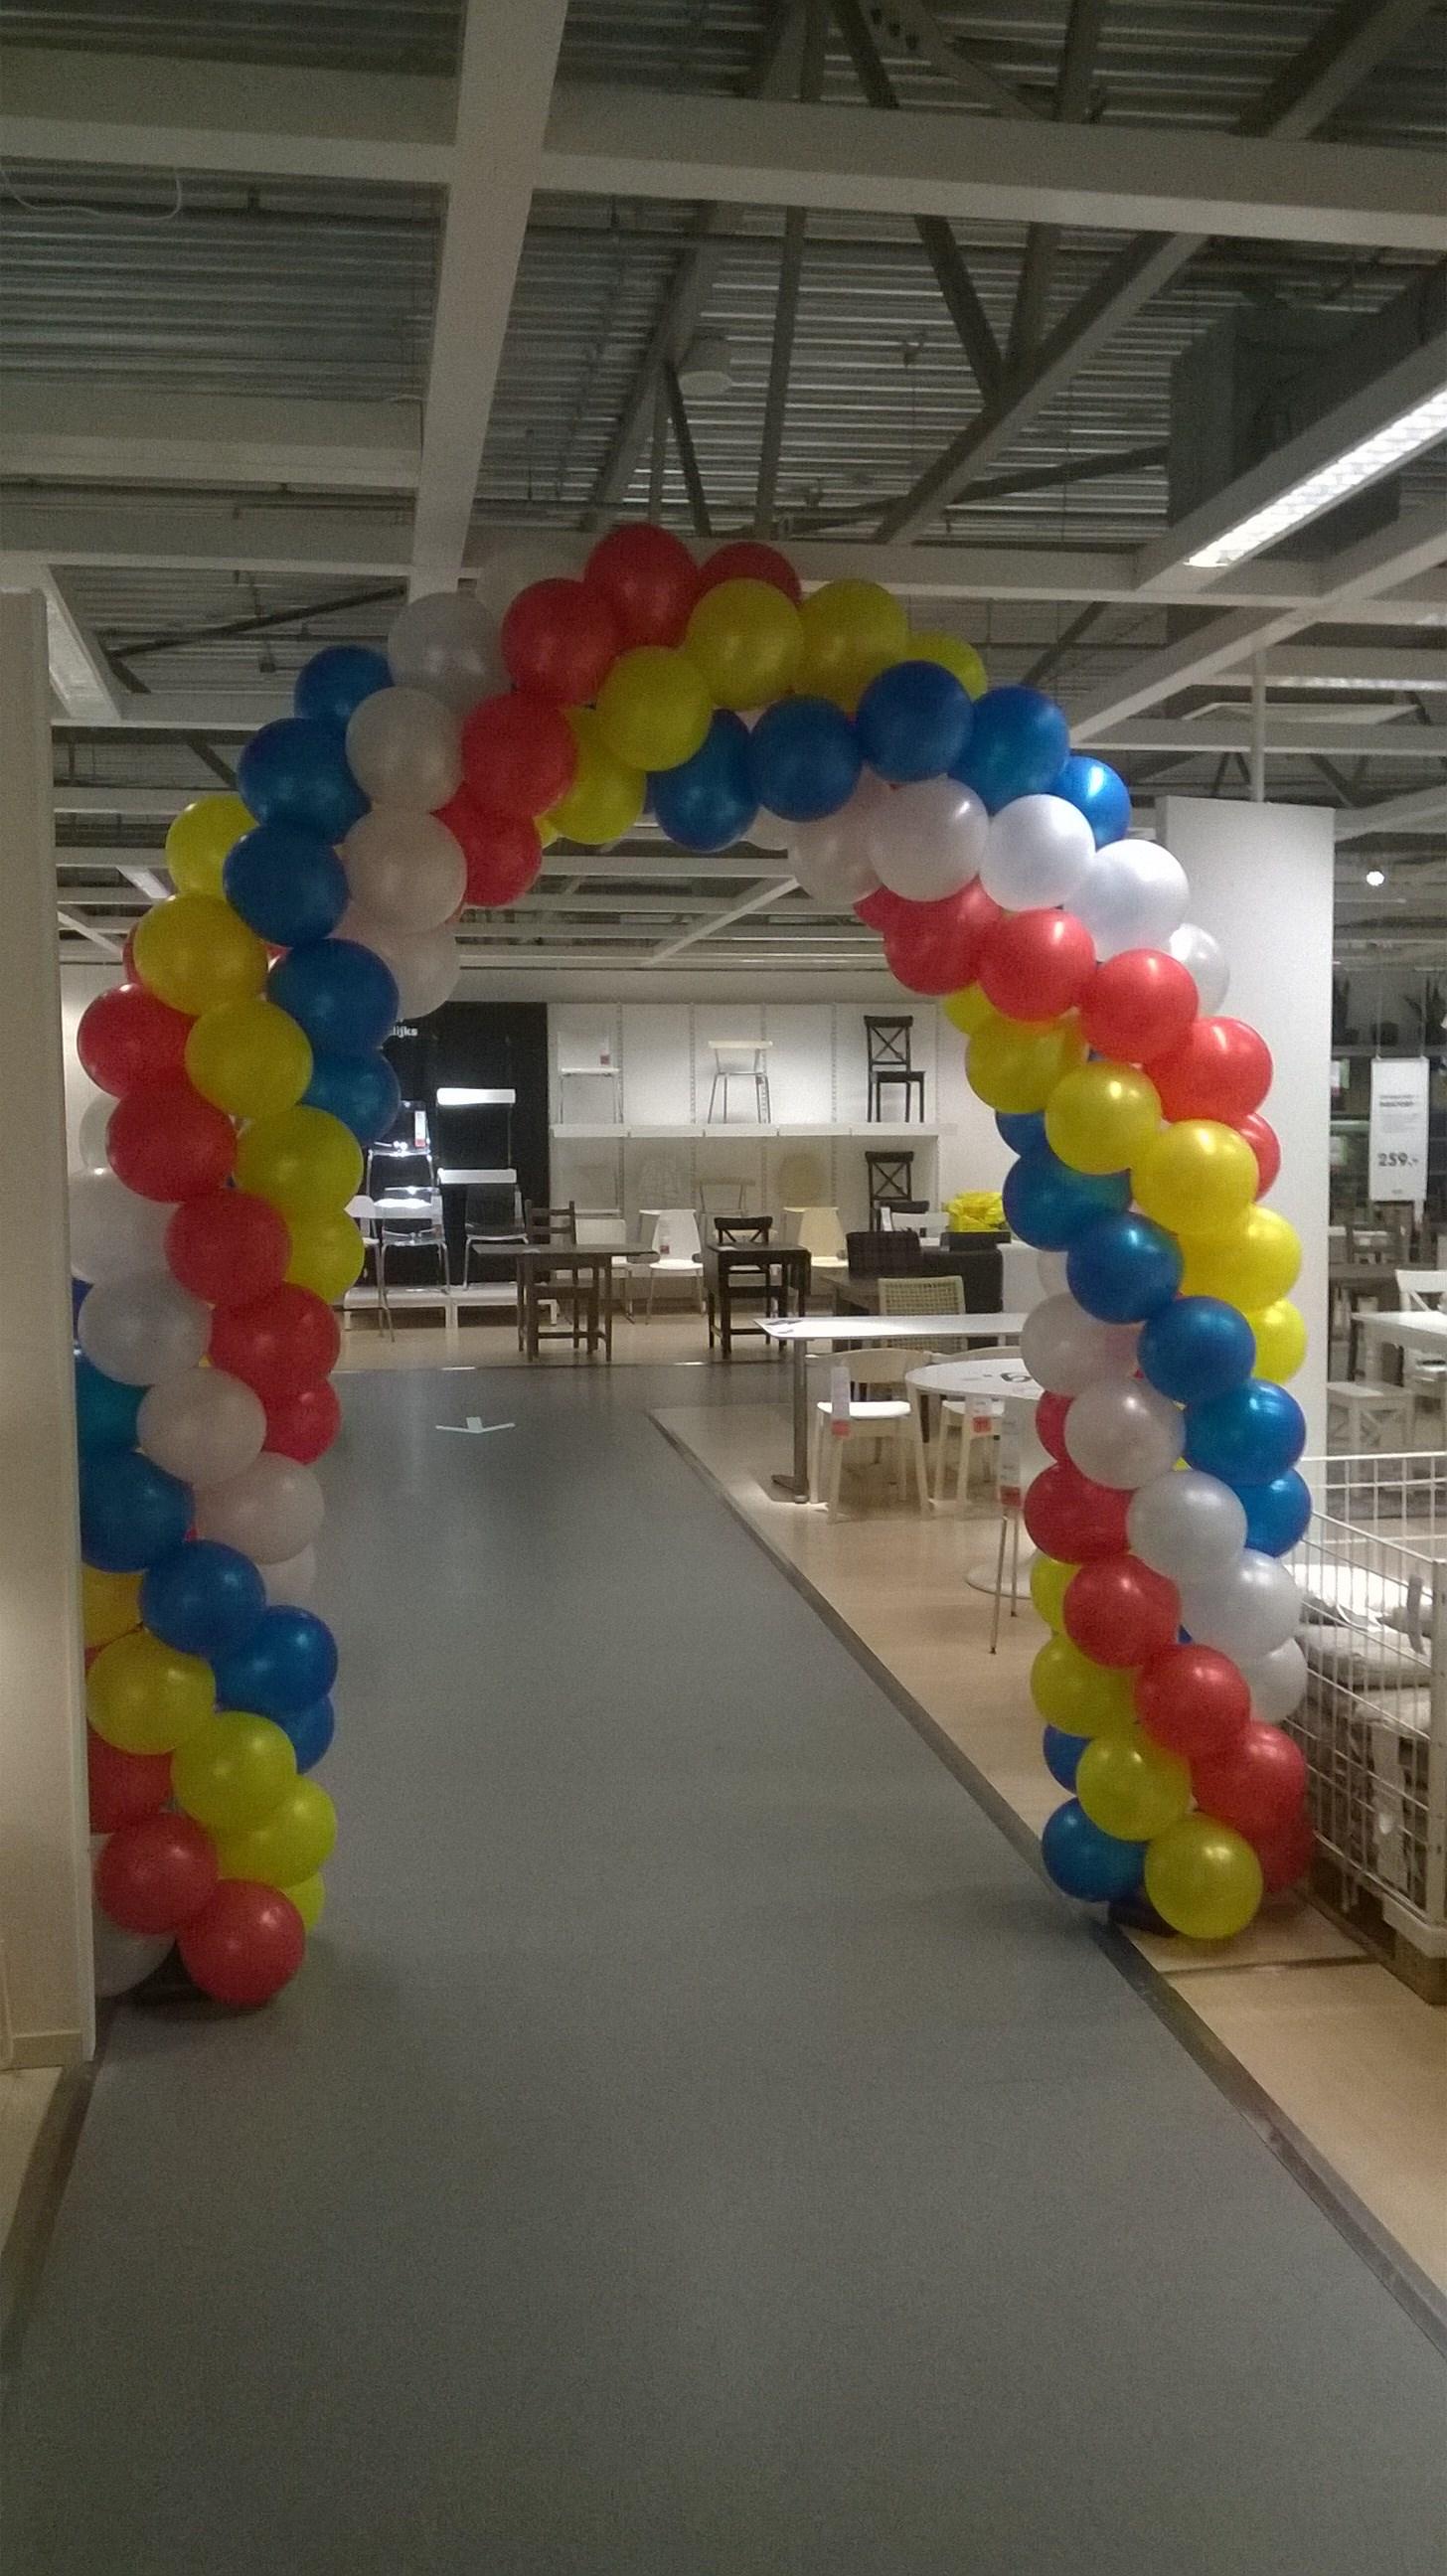 ballonnenboog opening nieuwe bedden afdeling Ikea Duiven